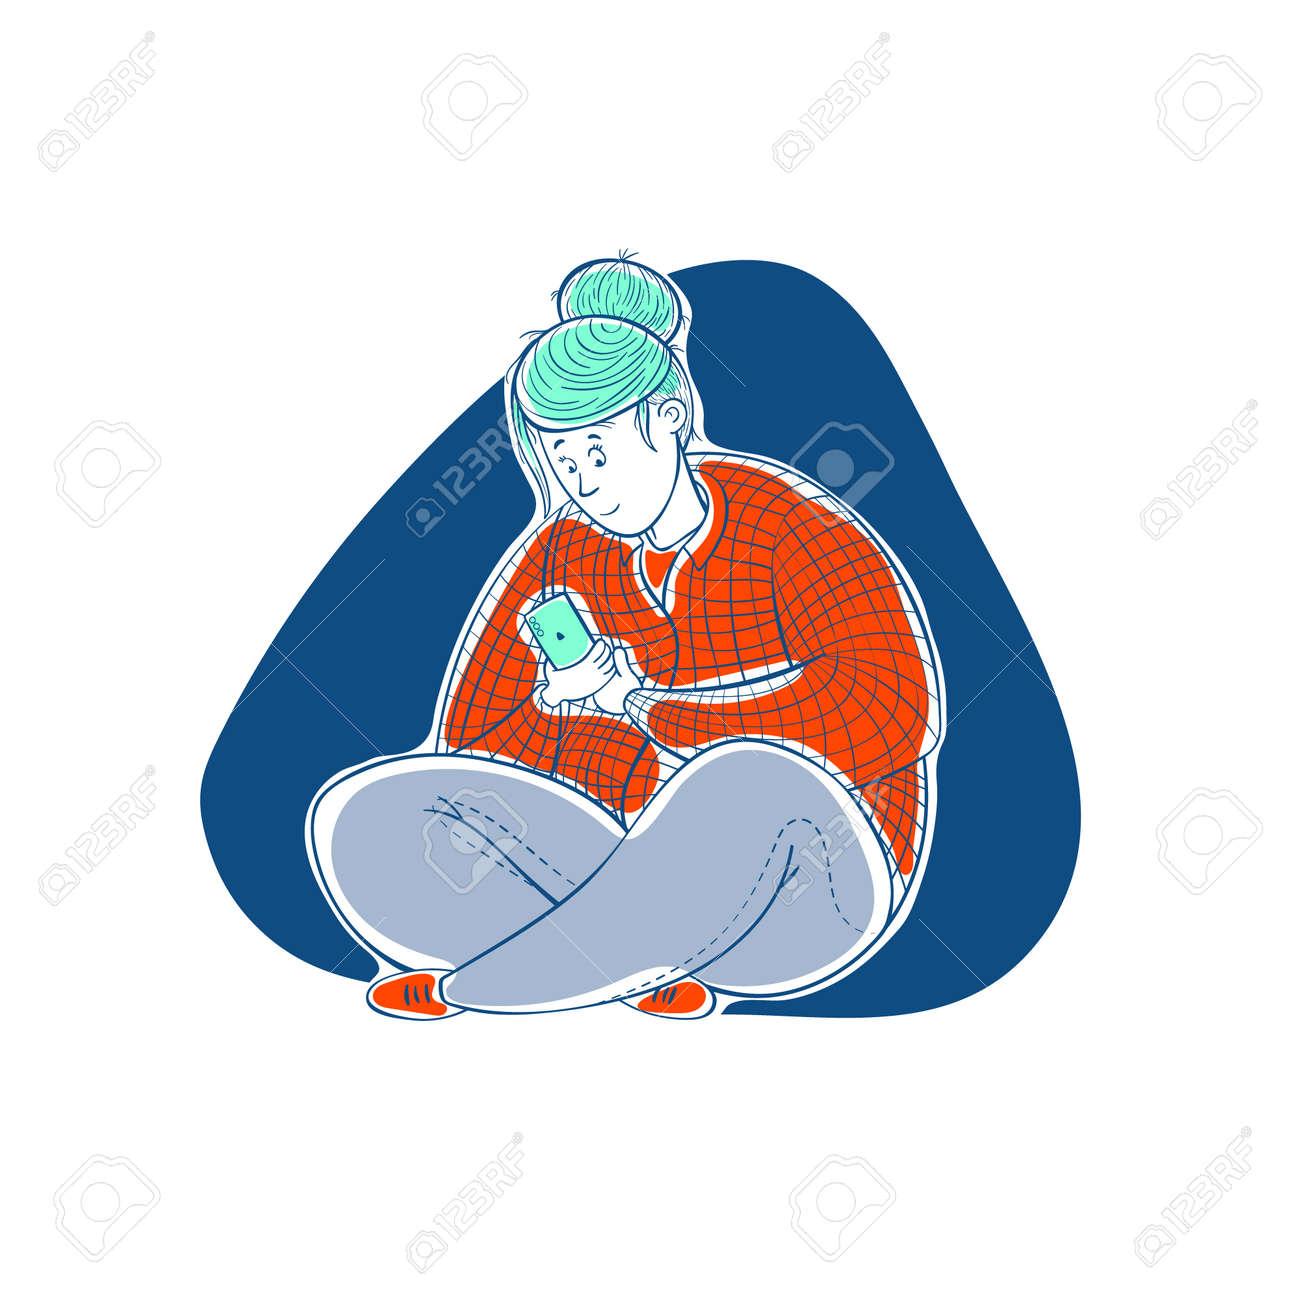 Girl corresponds in the phone. Love correspondence. Cartoon contour illustration in a vector. - 159585256